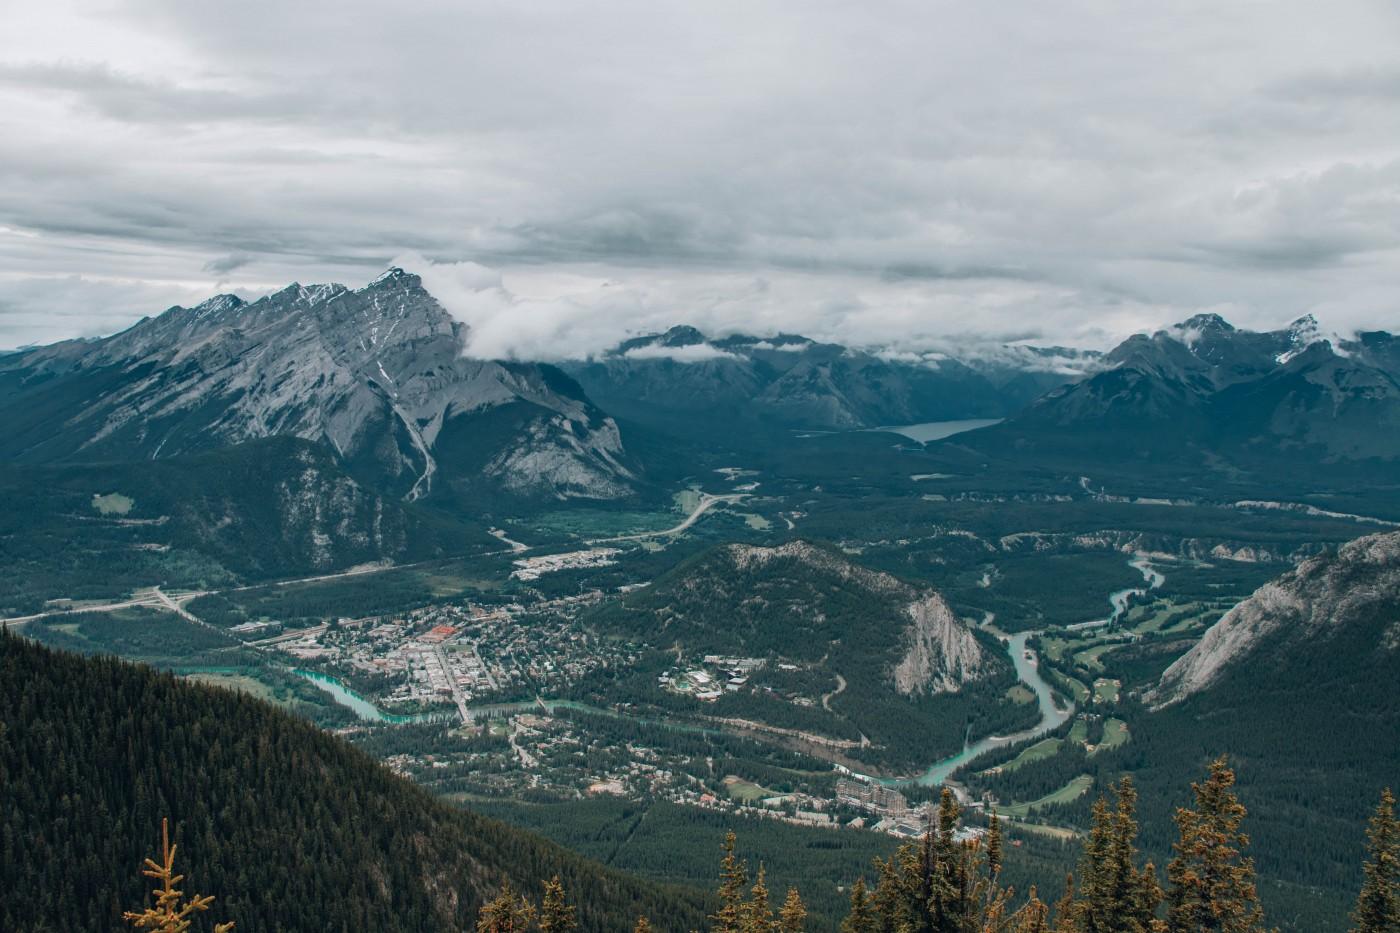 Sanson's Peak | Top 10 Photography Spots in Banff National Park